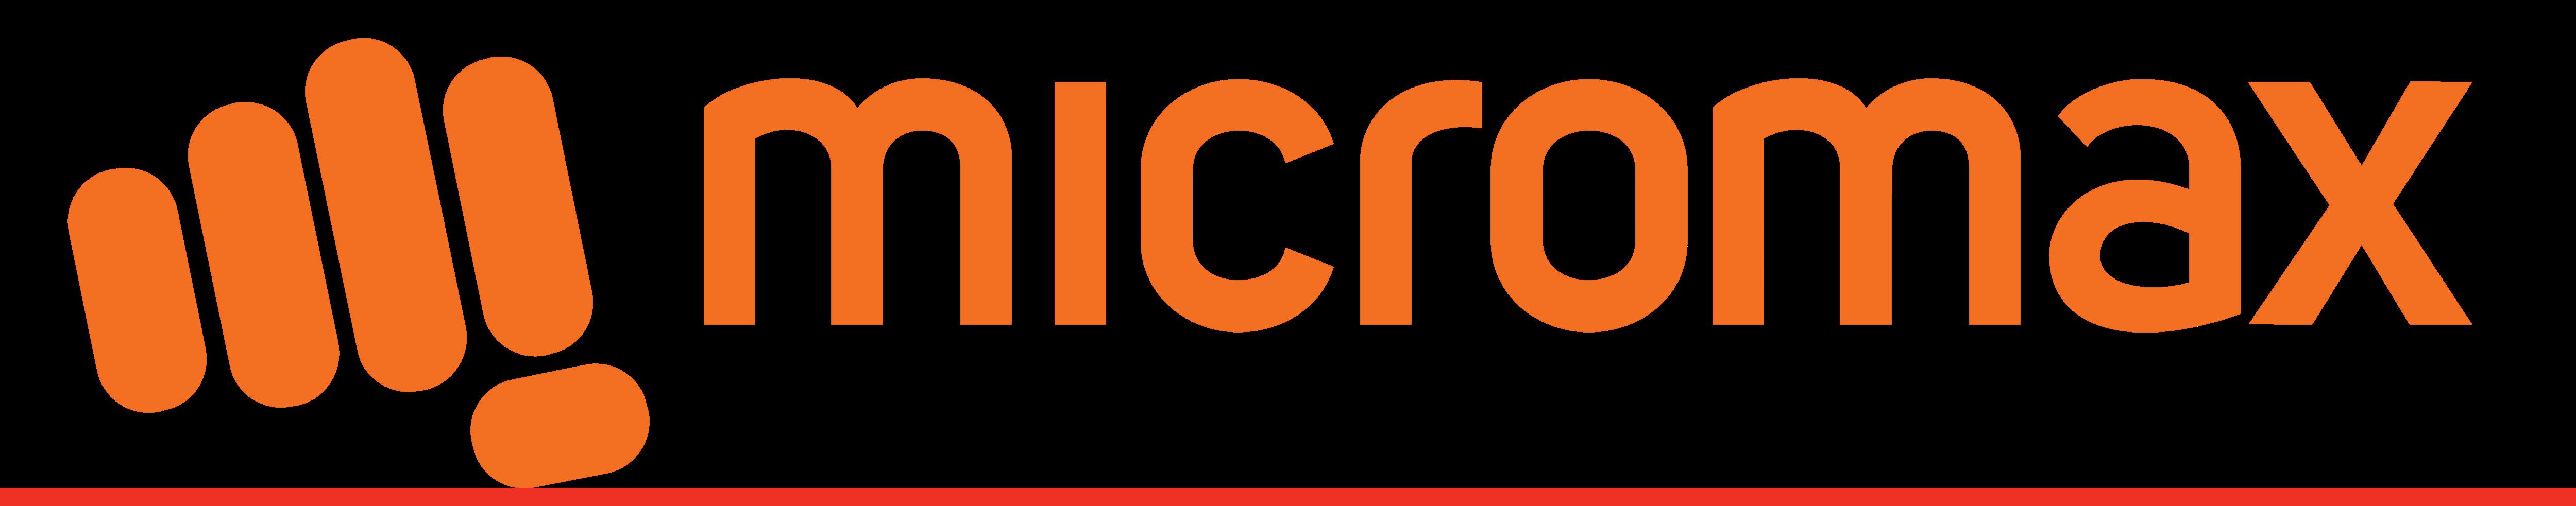 micromax � logos download